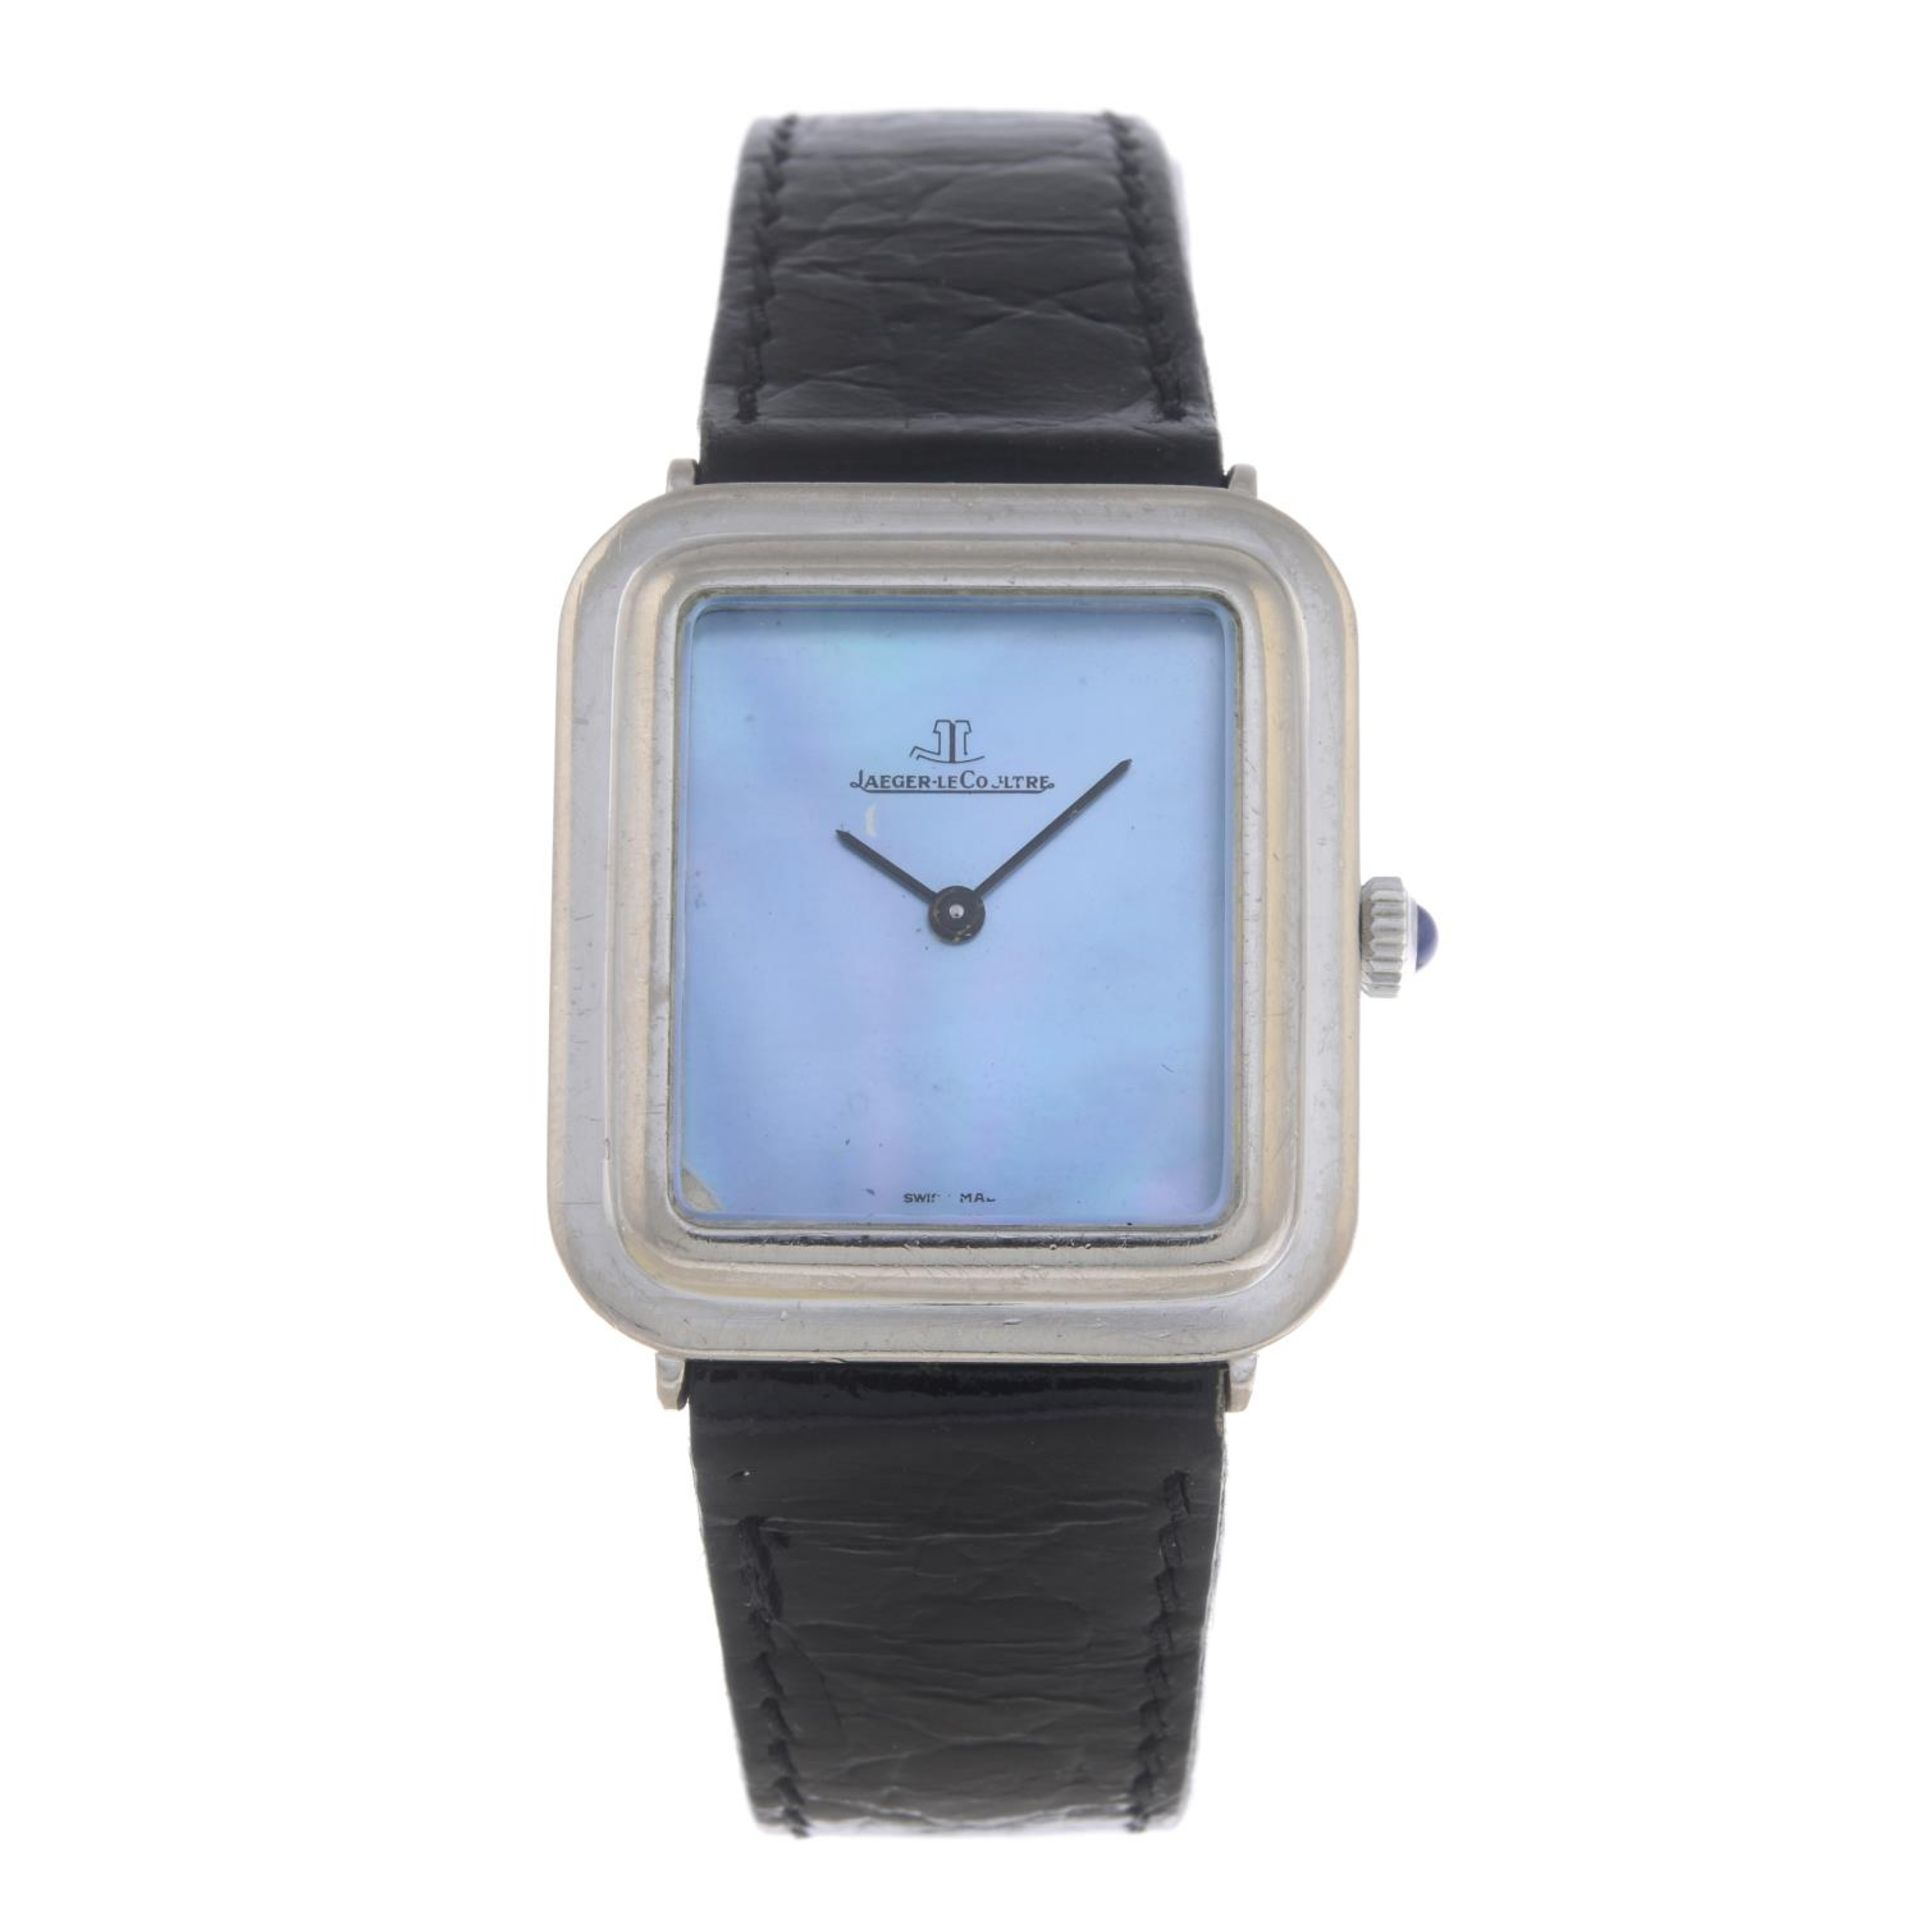 Los 38 - JAEGER-LECOULTRE - a lady's wrist watch.